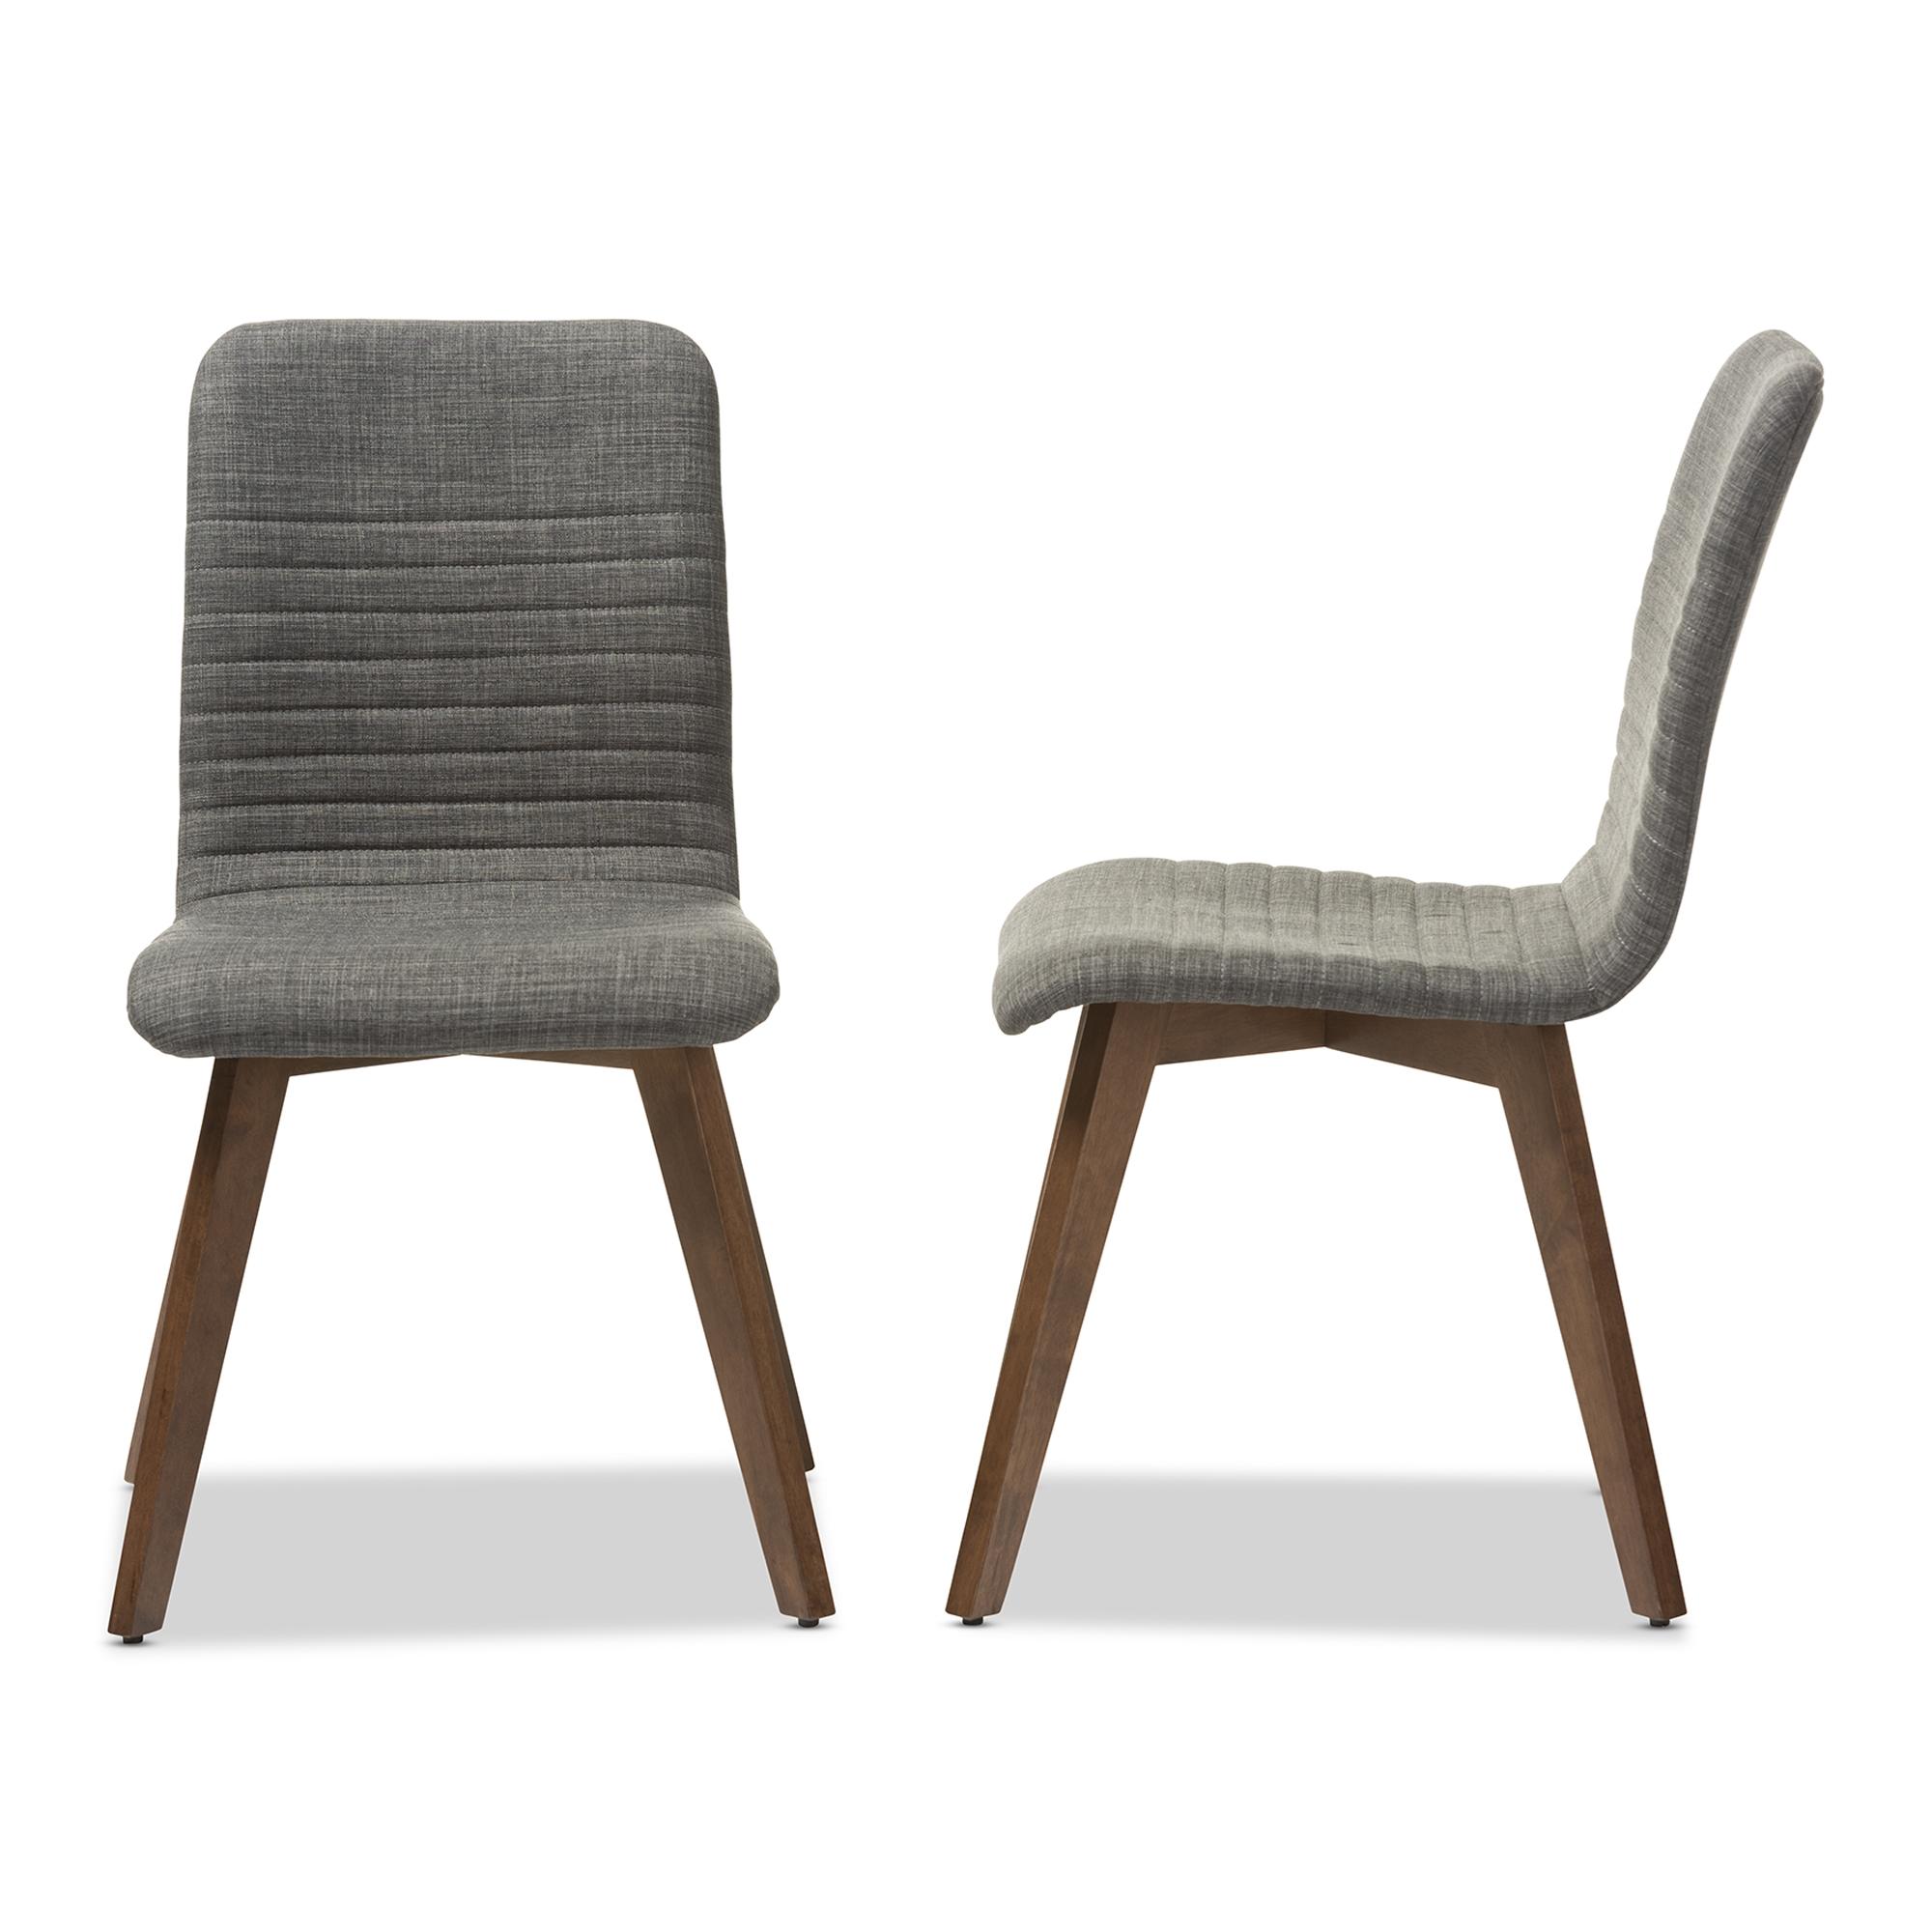 Baxton Studio Sugar Mid Century Retro Modern Scandinavian Style Dark Grey  Fabric Upholstered Walnut Wood ...